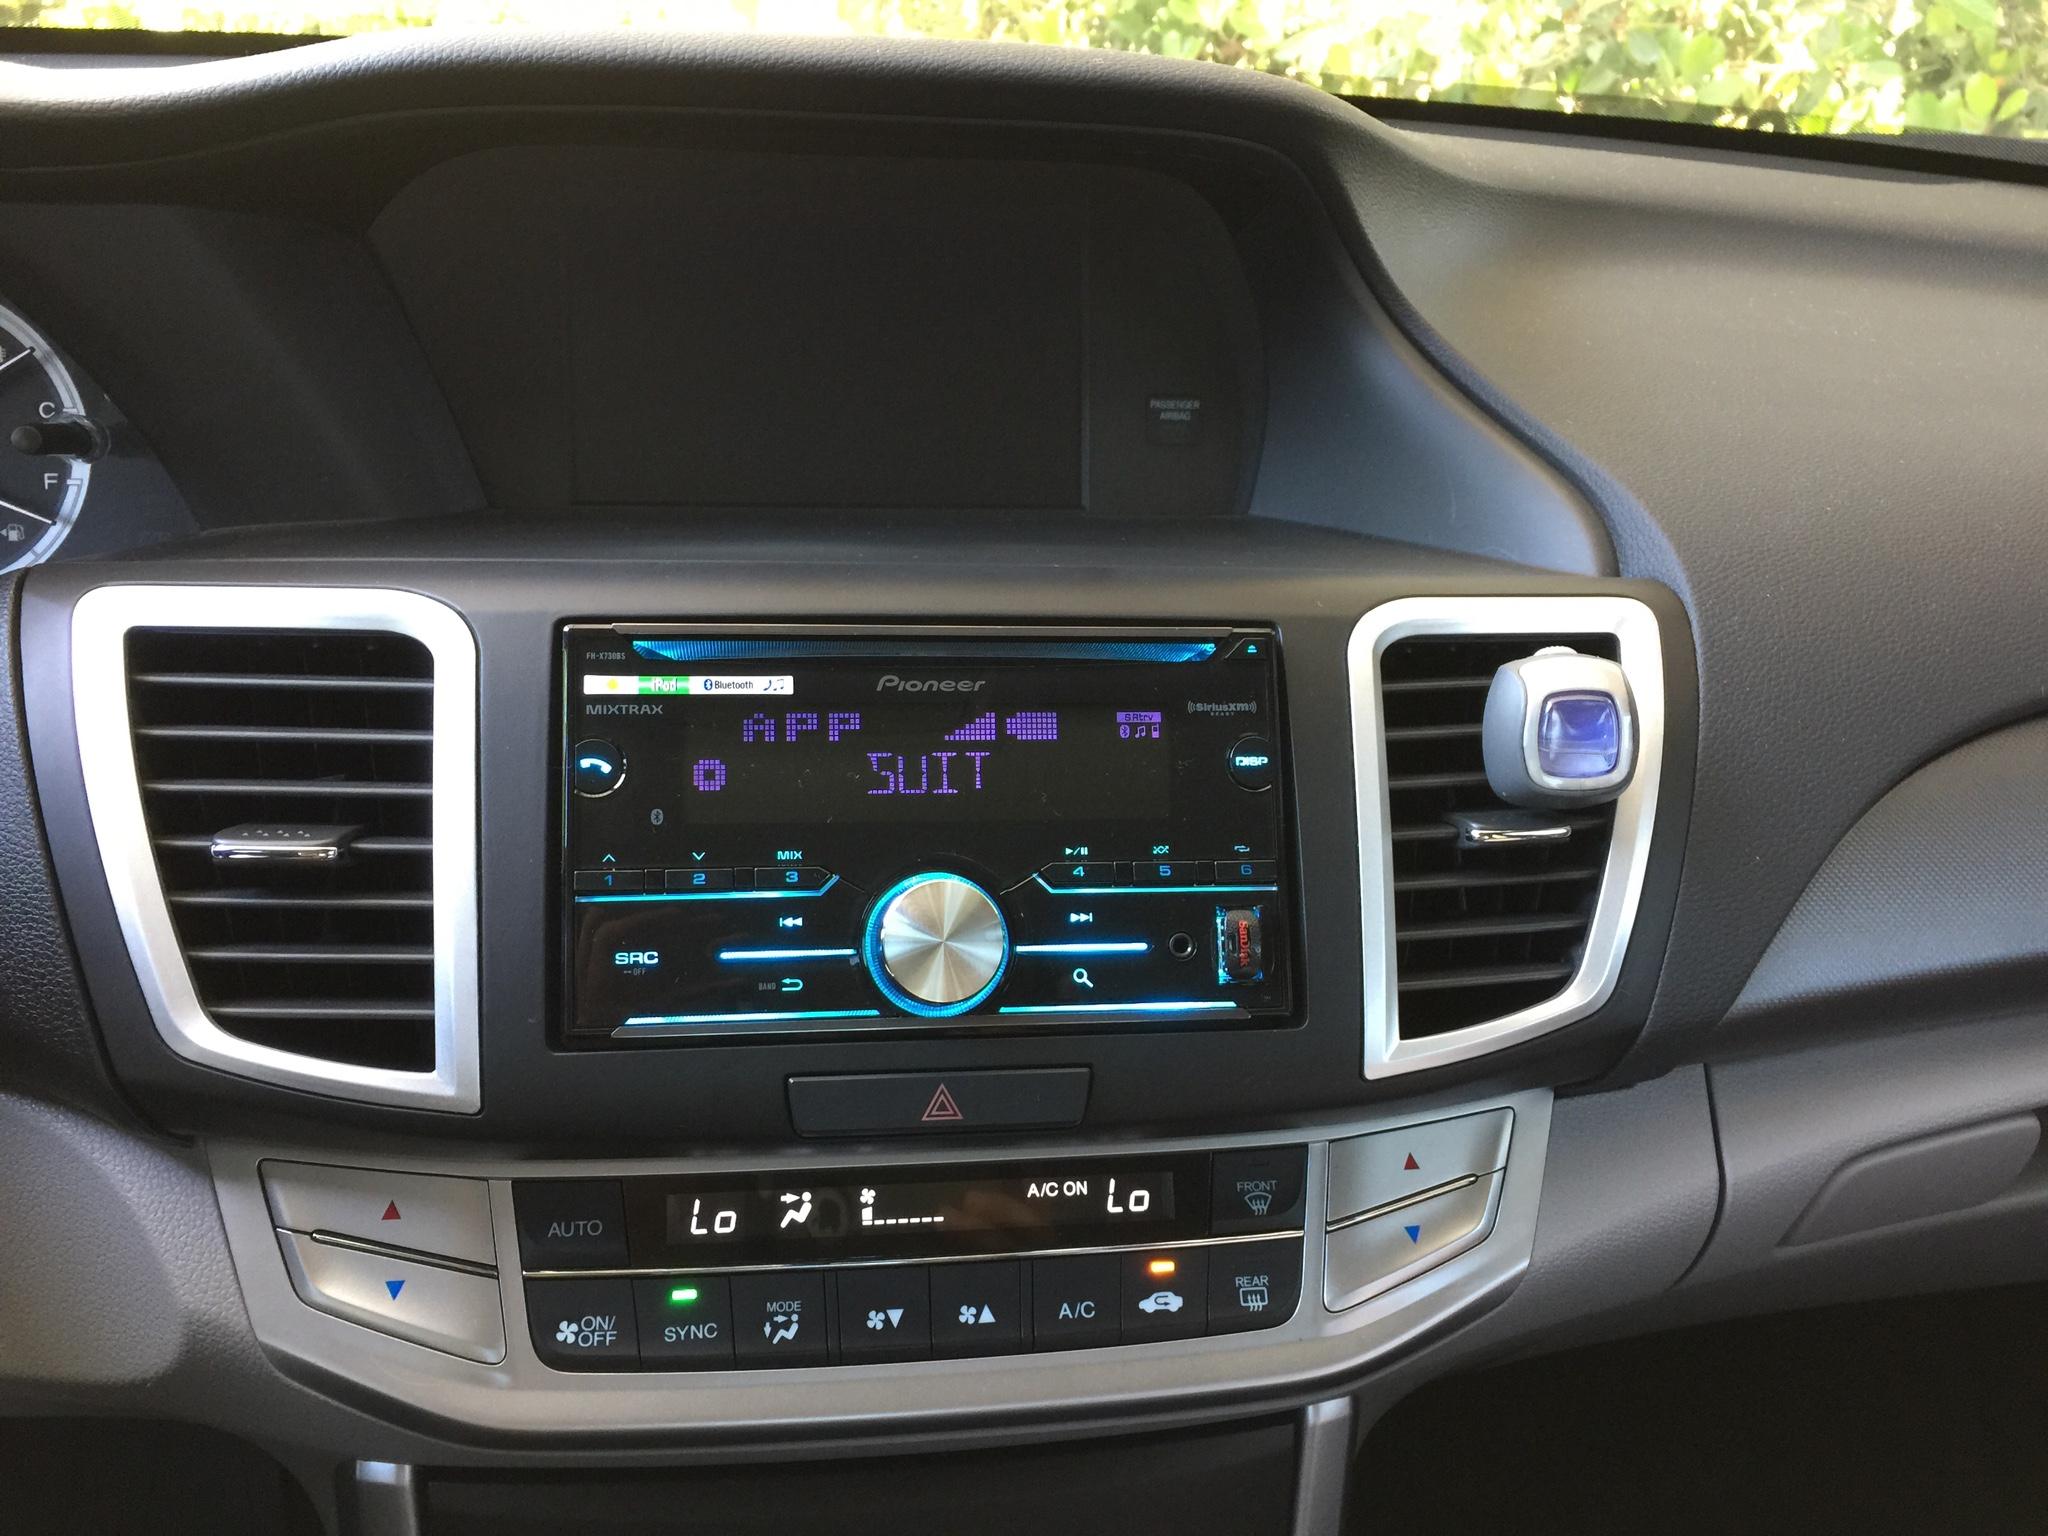 Honda Accord Speaker Upgrade Upgrading Stock Speakers Drive Head Unit Overclockers Australia Pix Euro Cu2 Stereo